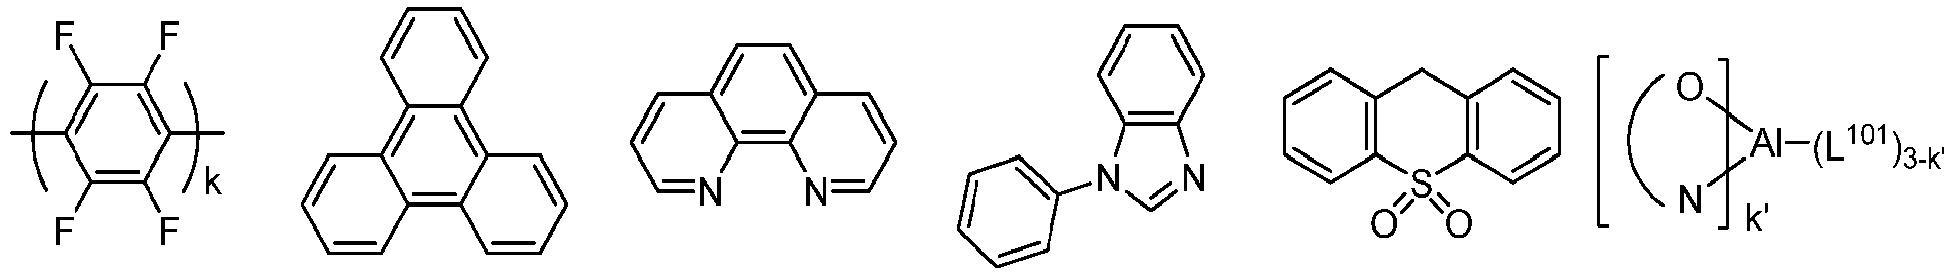 Figure imgb0097